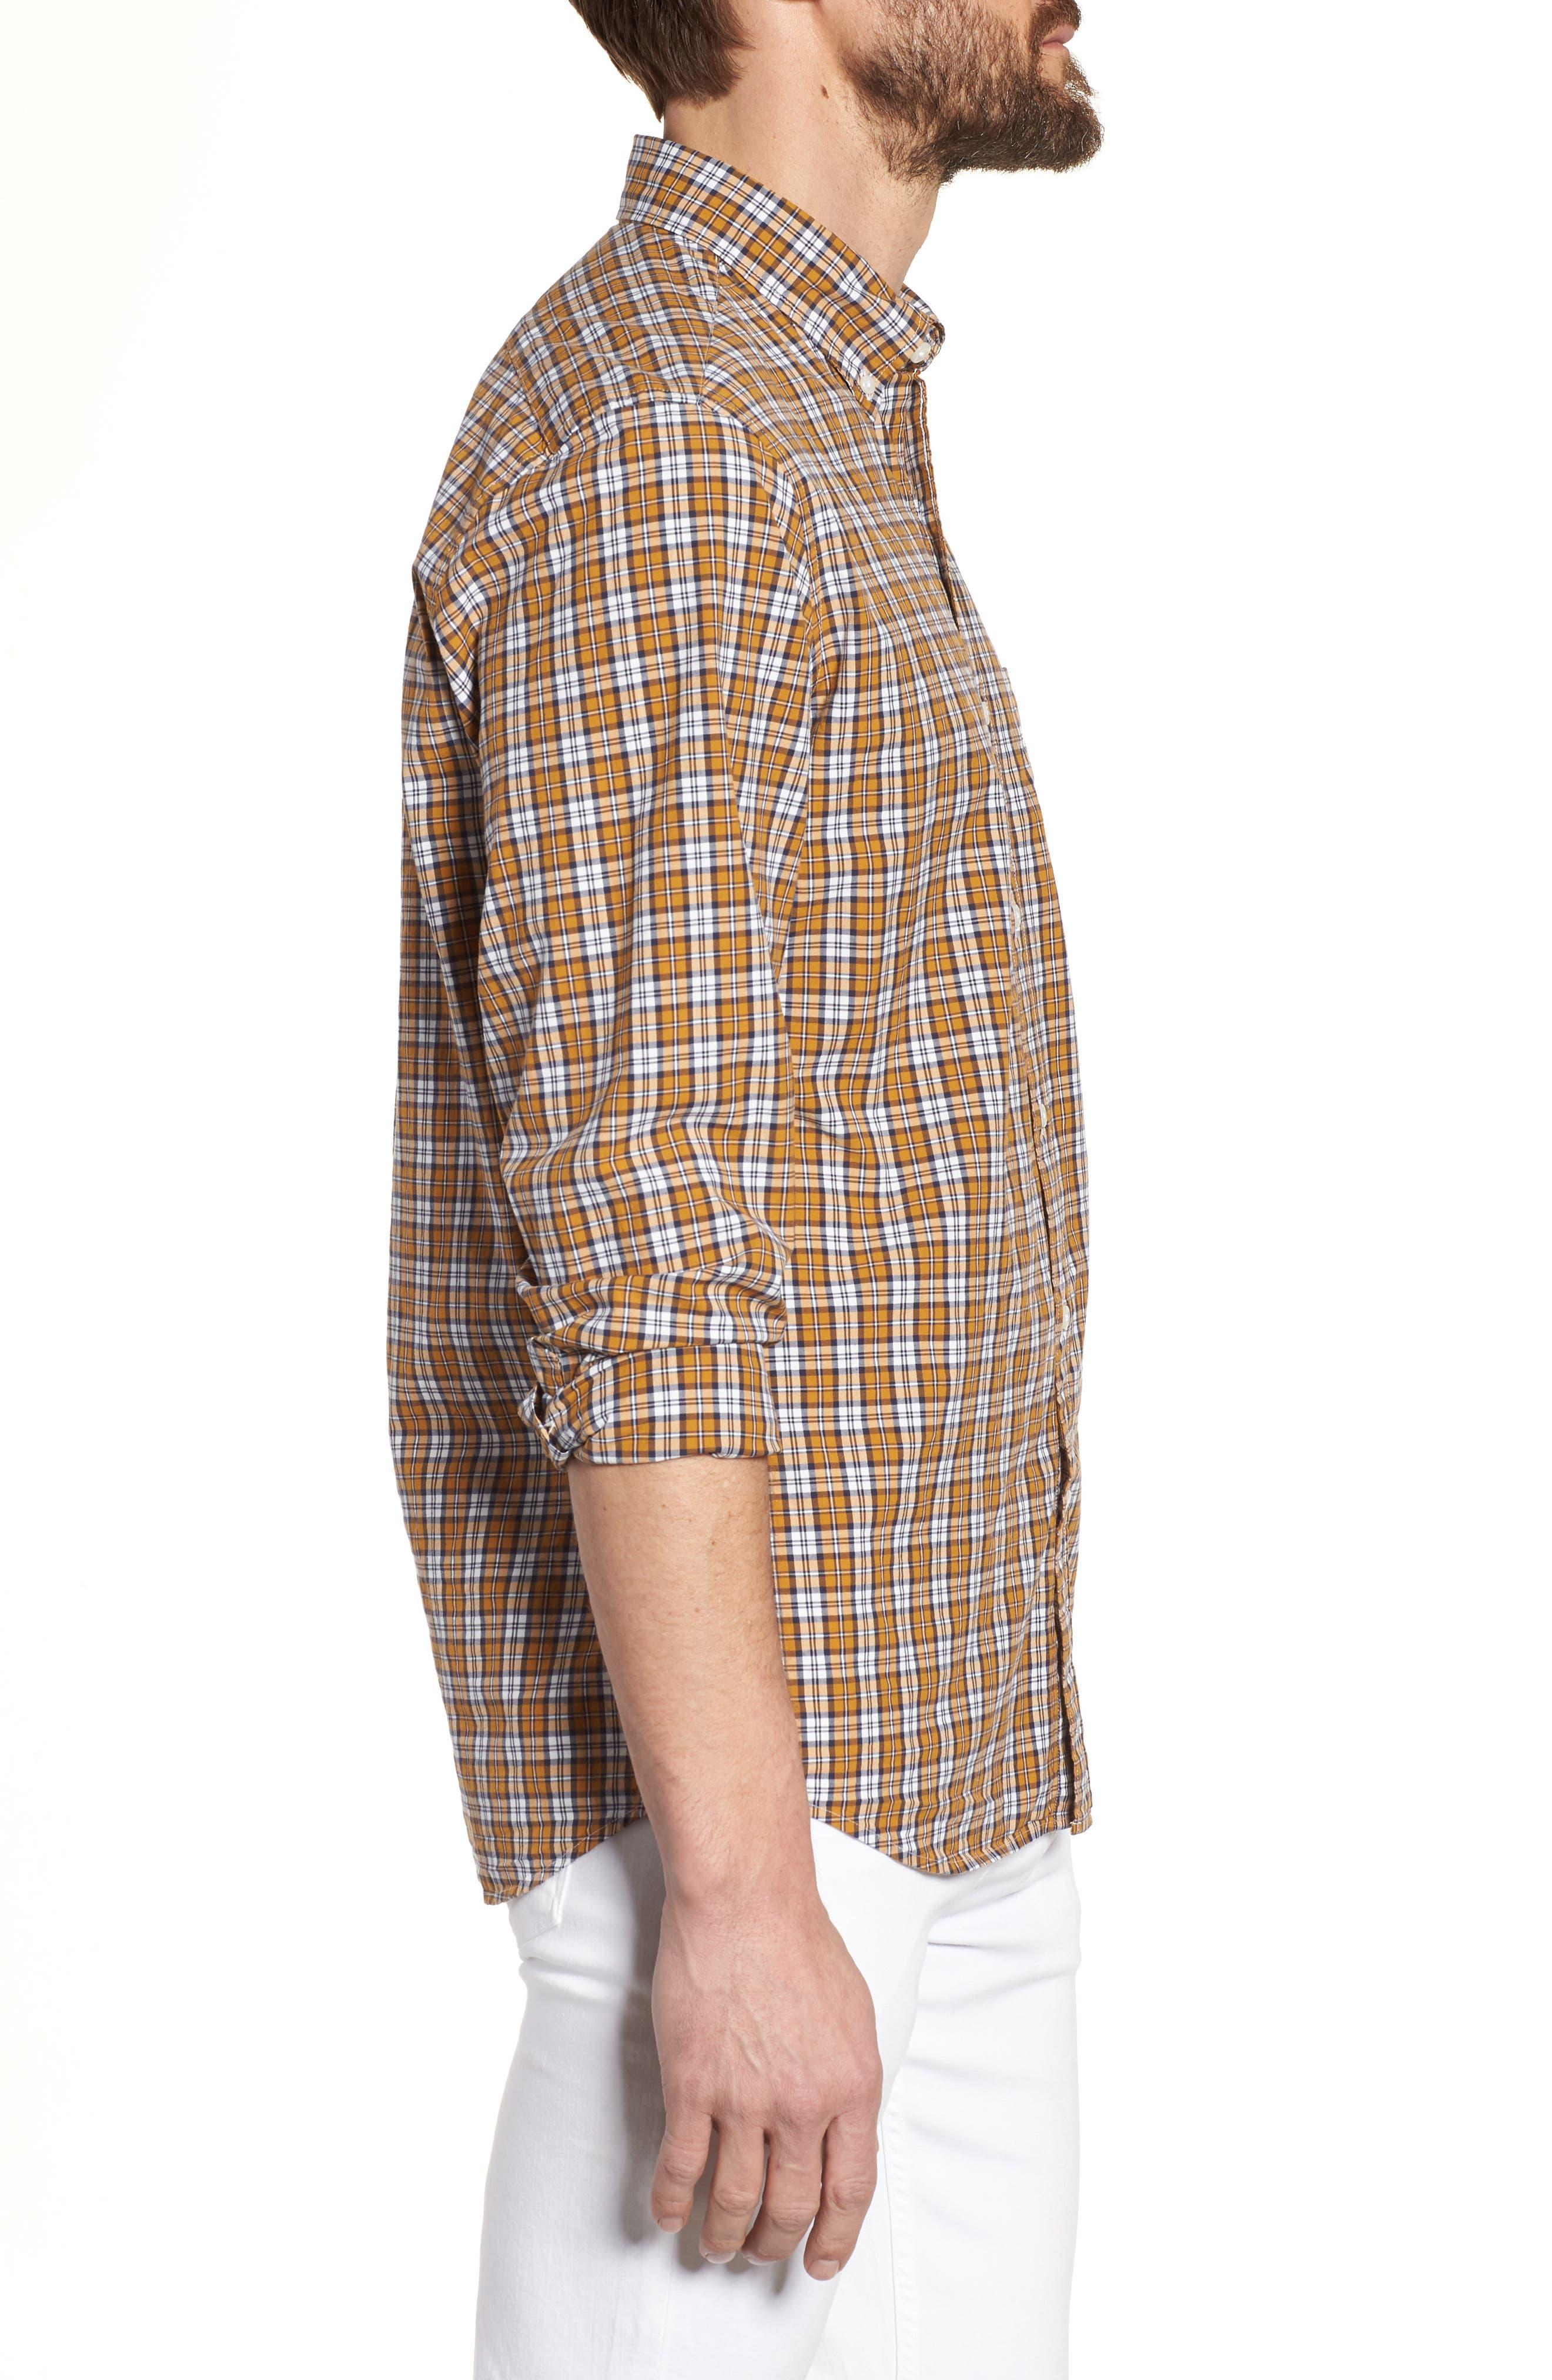 J.Crew Slim Fit Stretch Secret Wash Plaid Sport Shirt,                             Alternate thumbnail 3, color,                             Warm Cider